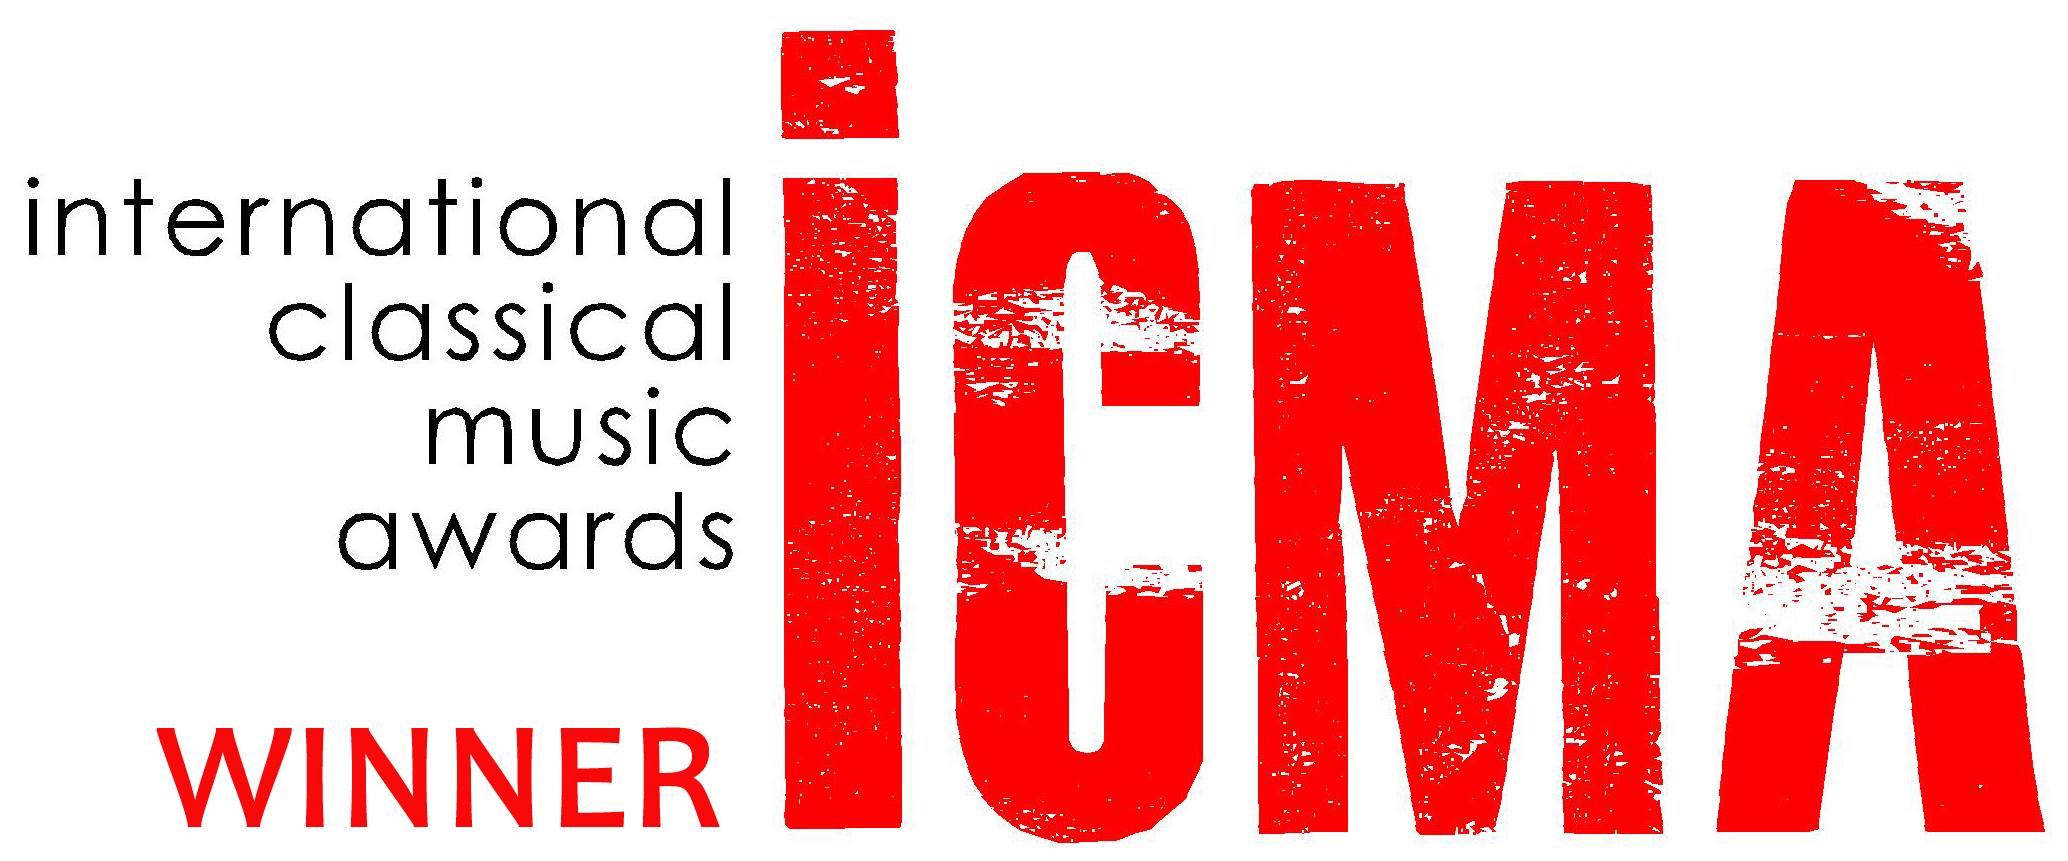 ICMA International Classical Music Award